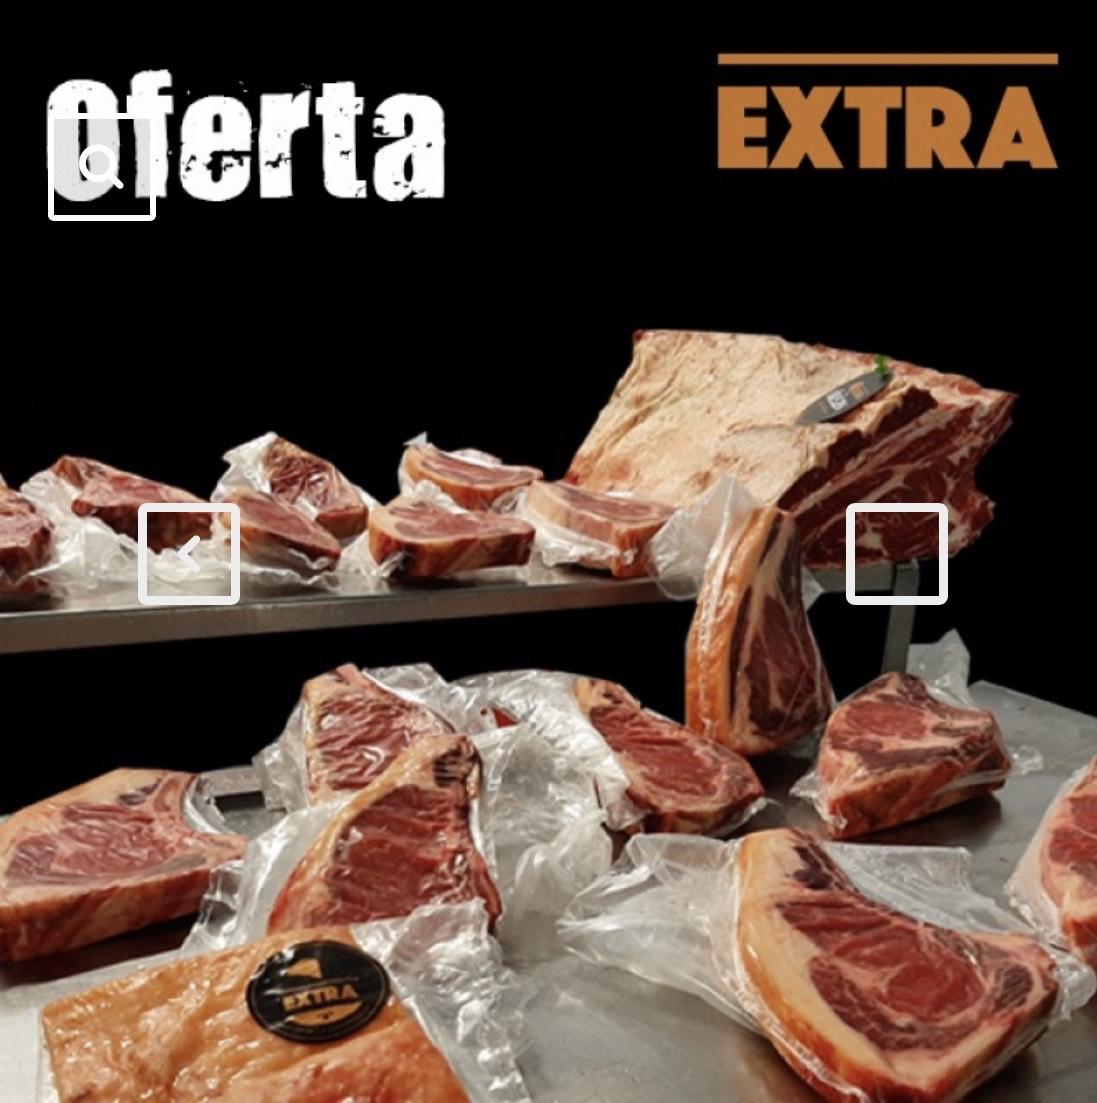 Pack de chuletas de vaca Extra (11kg)